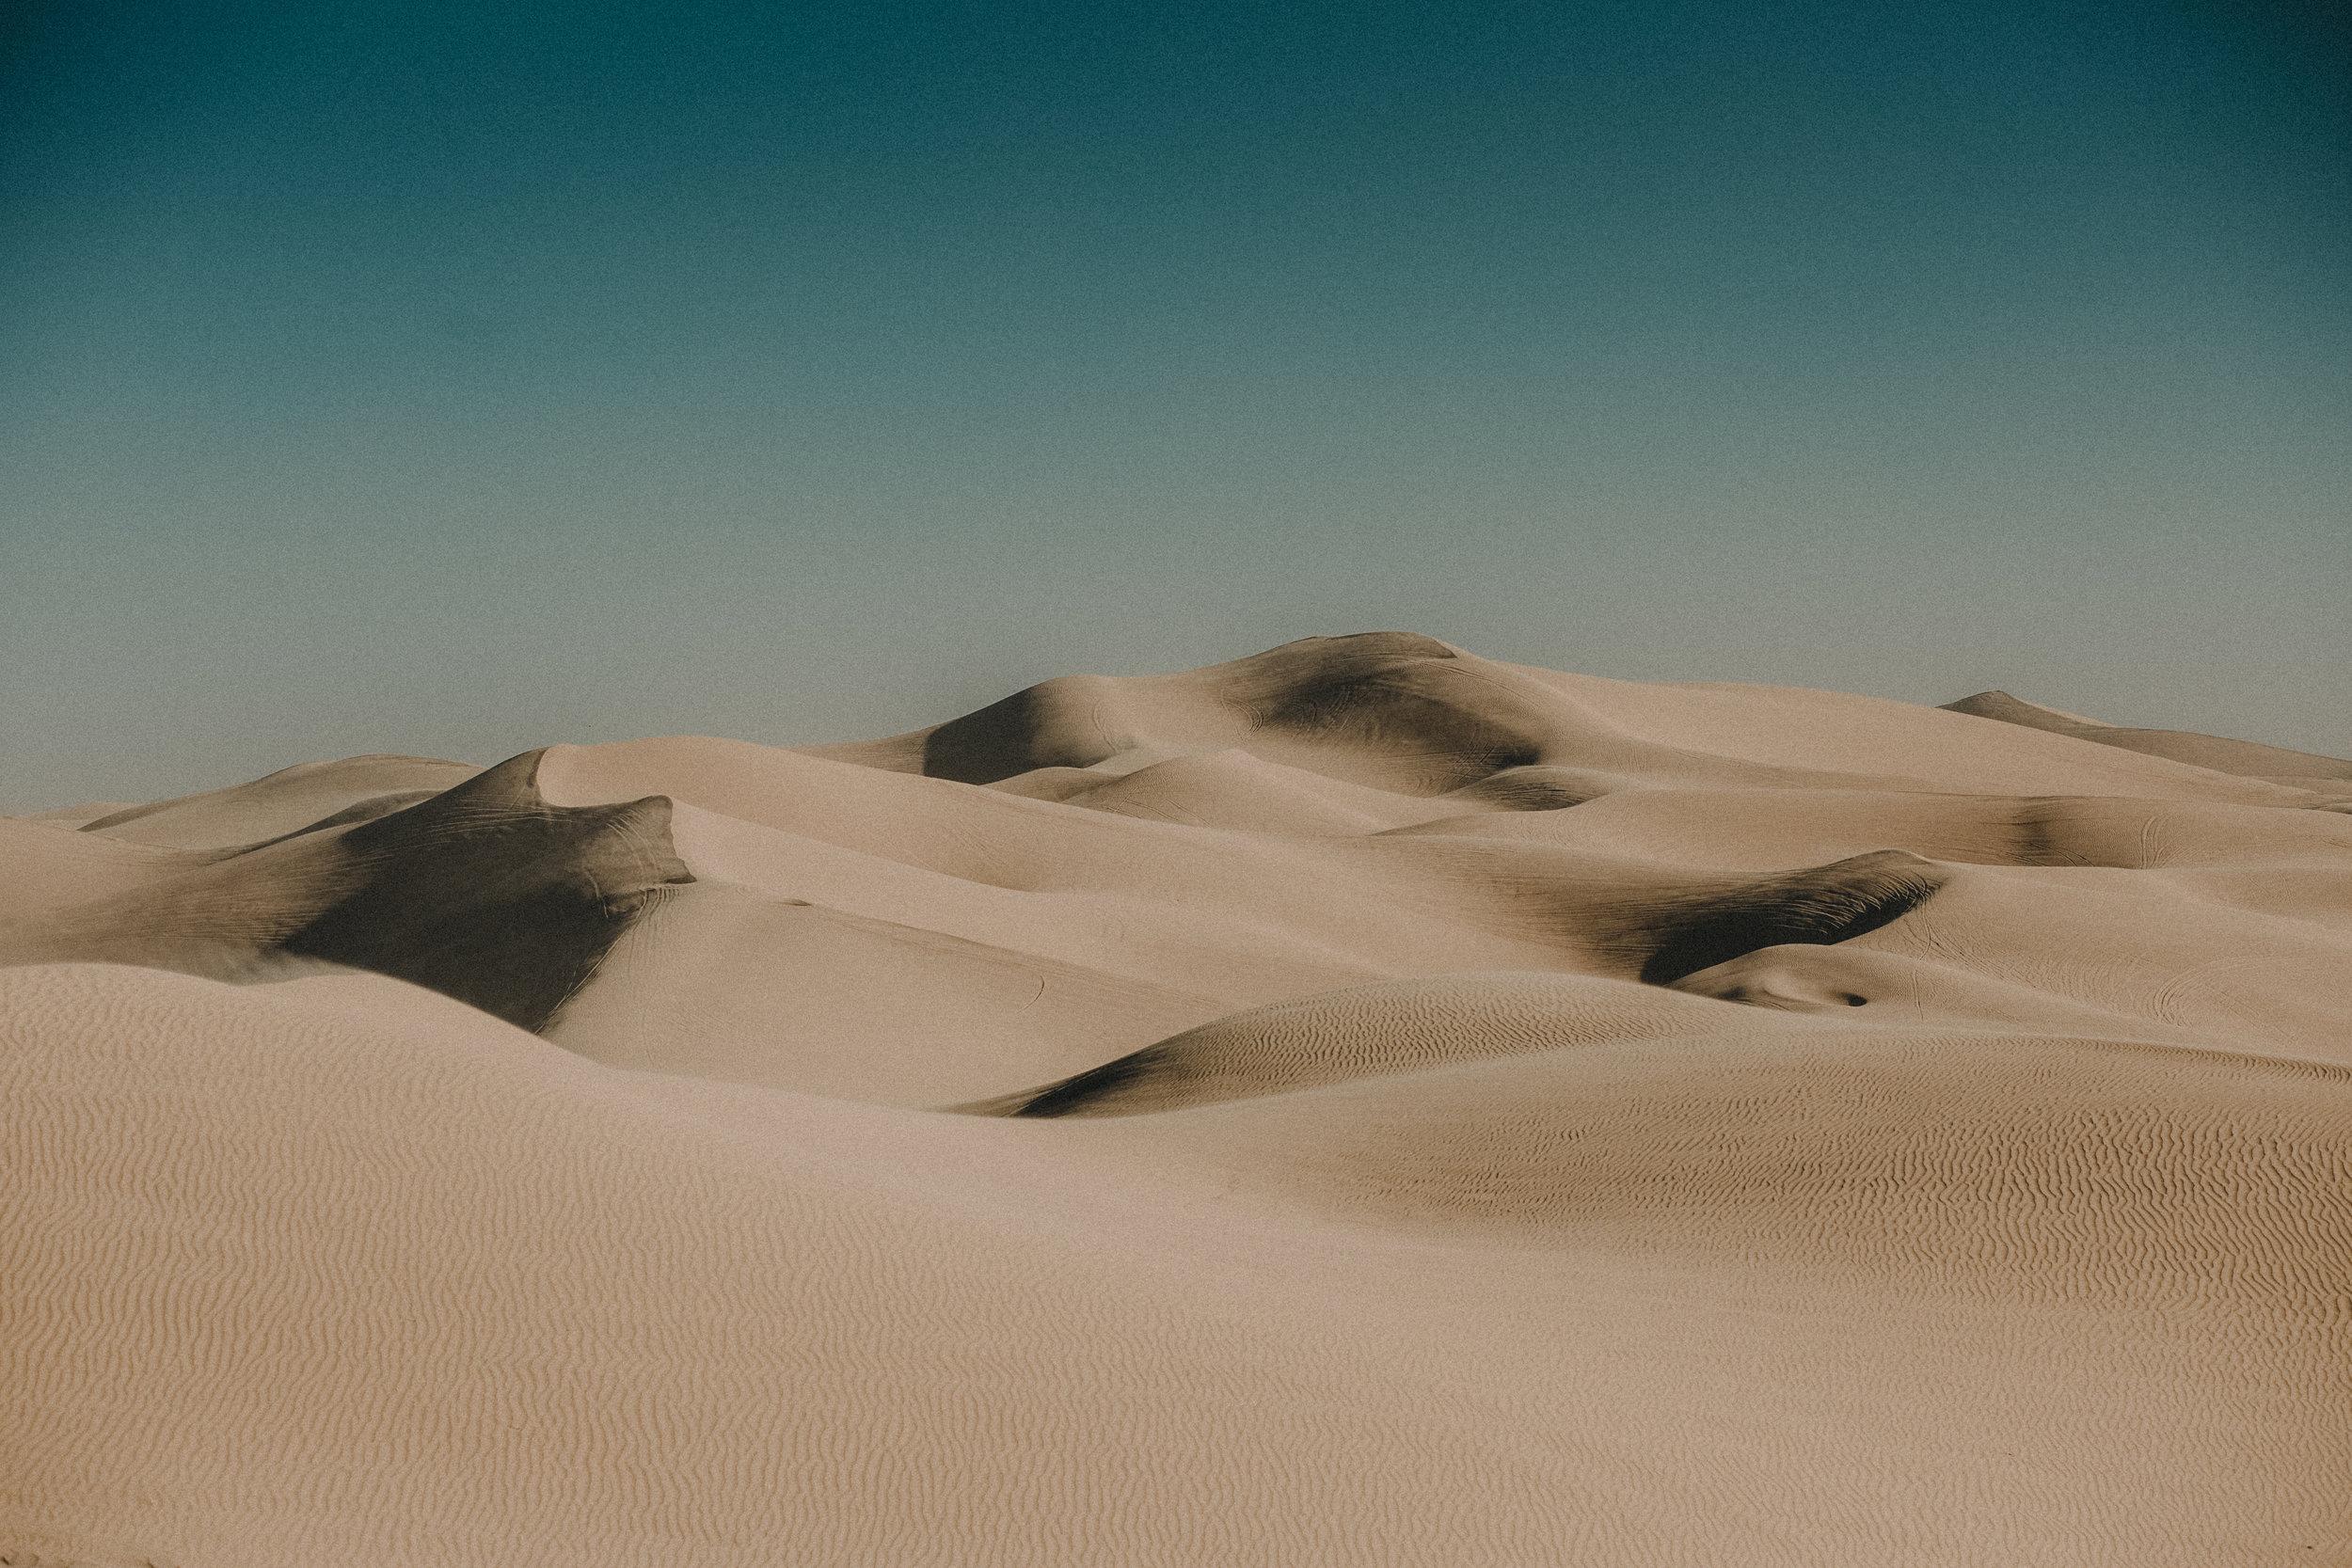 01/30/16 - IMPERIAL SAND DUNES, CALIFORNIA, U.S.A.